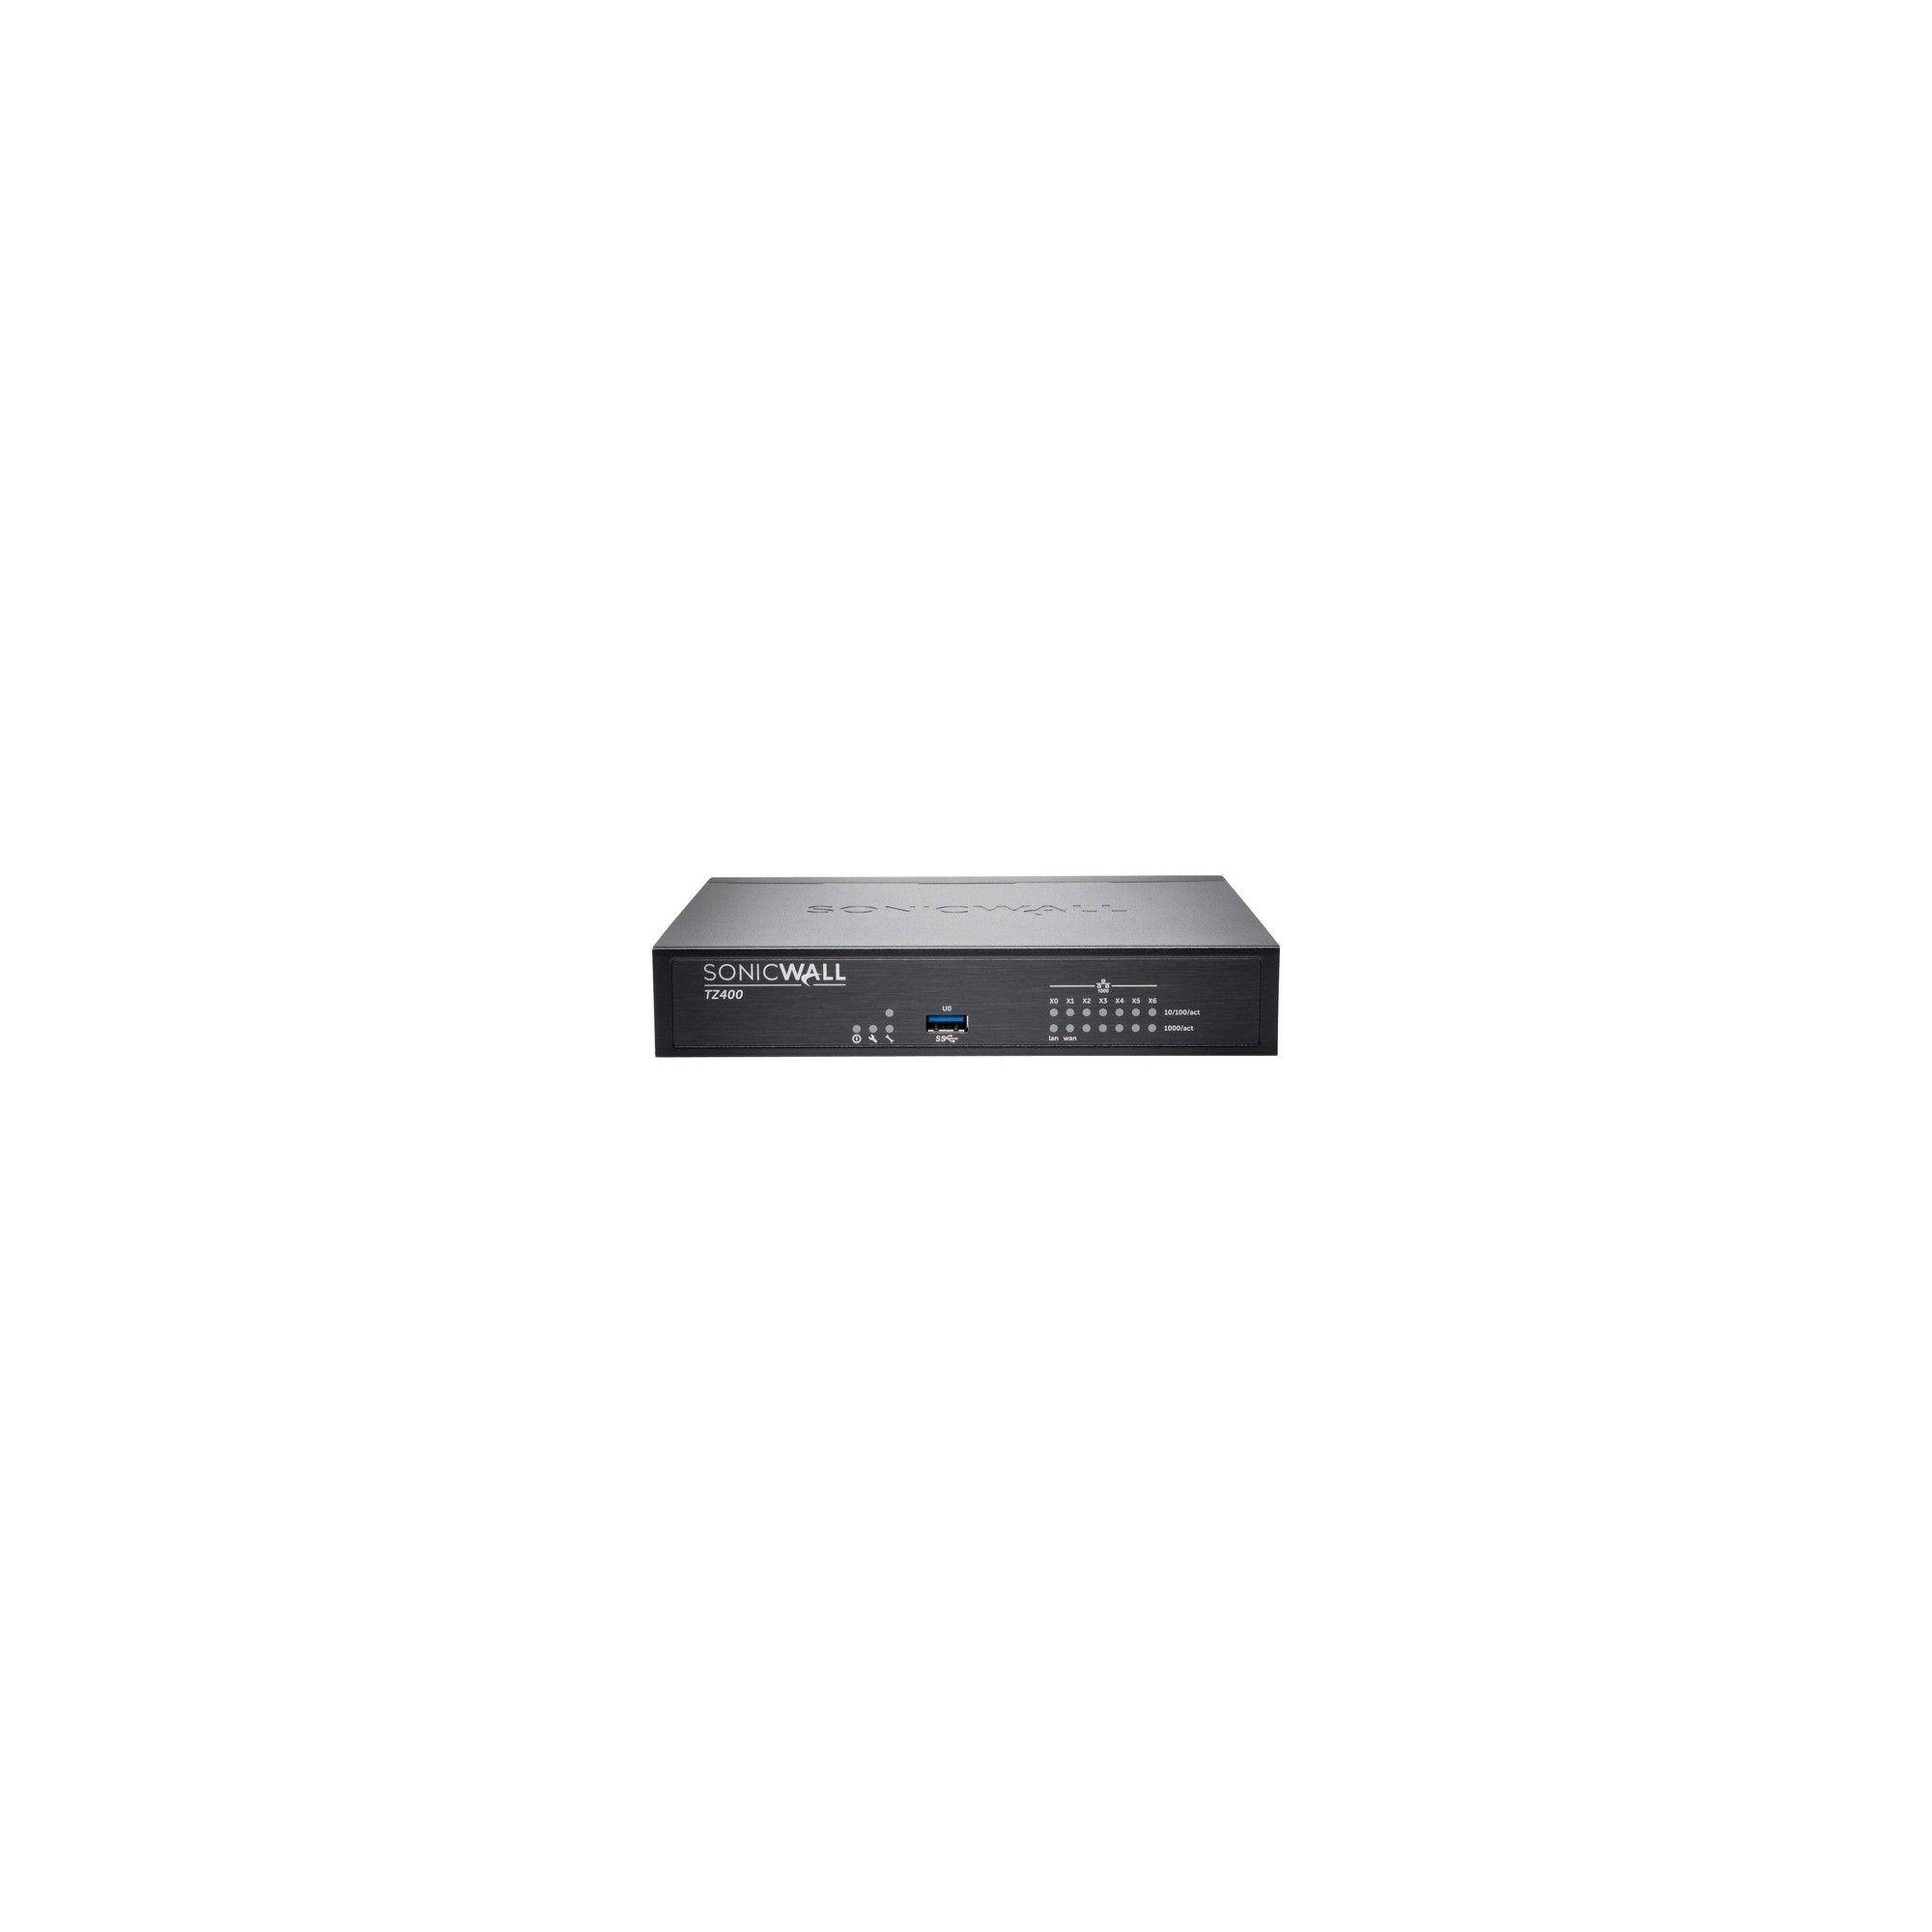 SonicWall TZ400 Network Security/Firewall Appliance in 2019